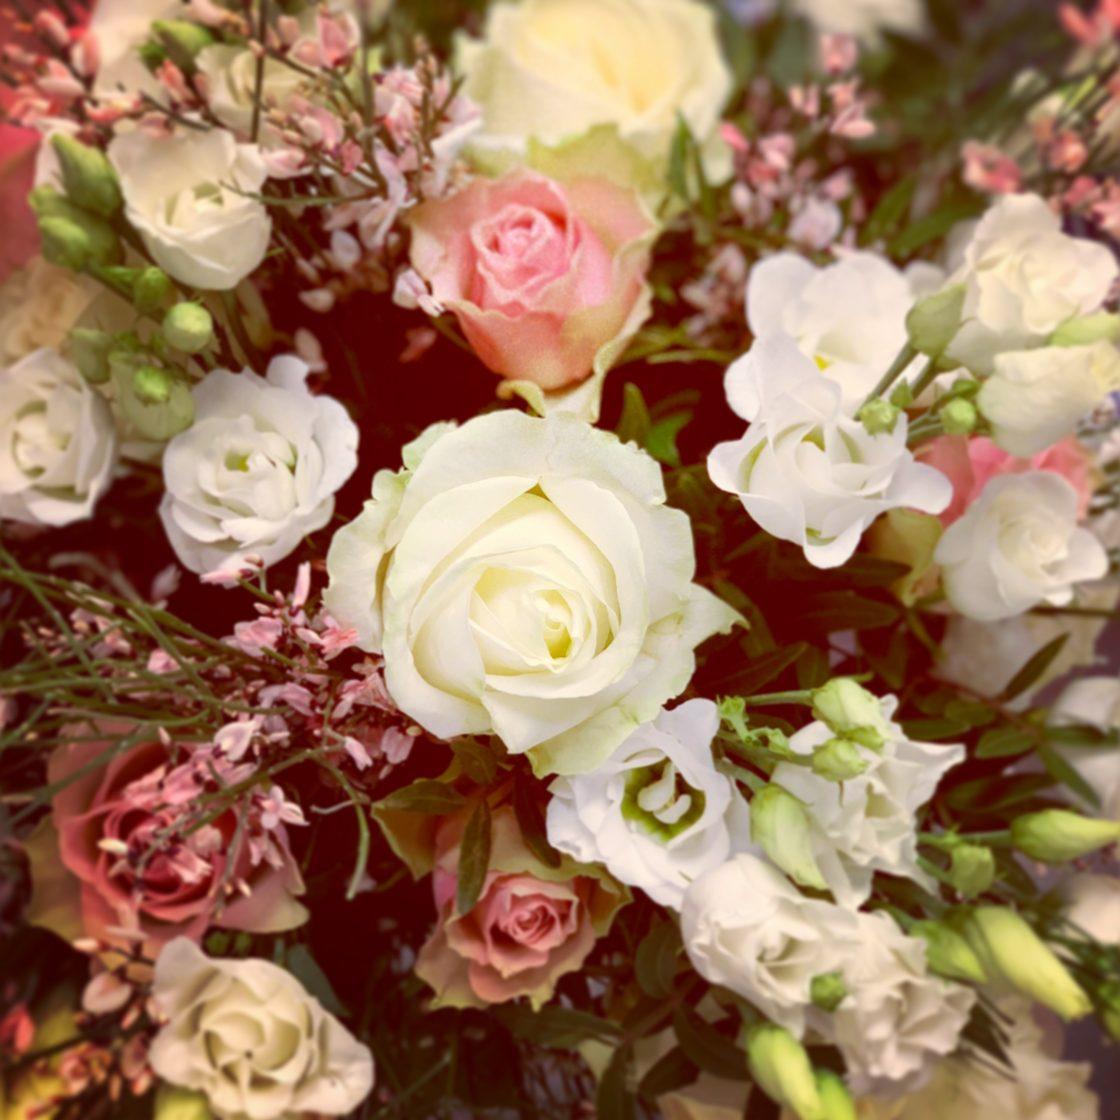 Bloemen.jpeg